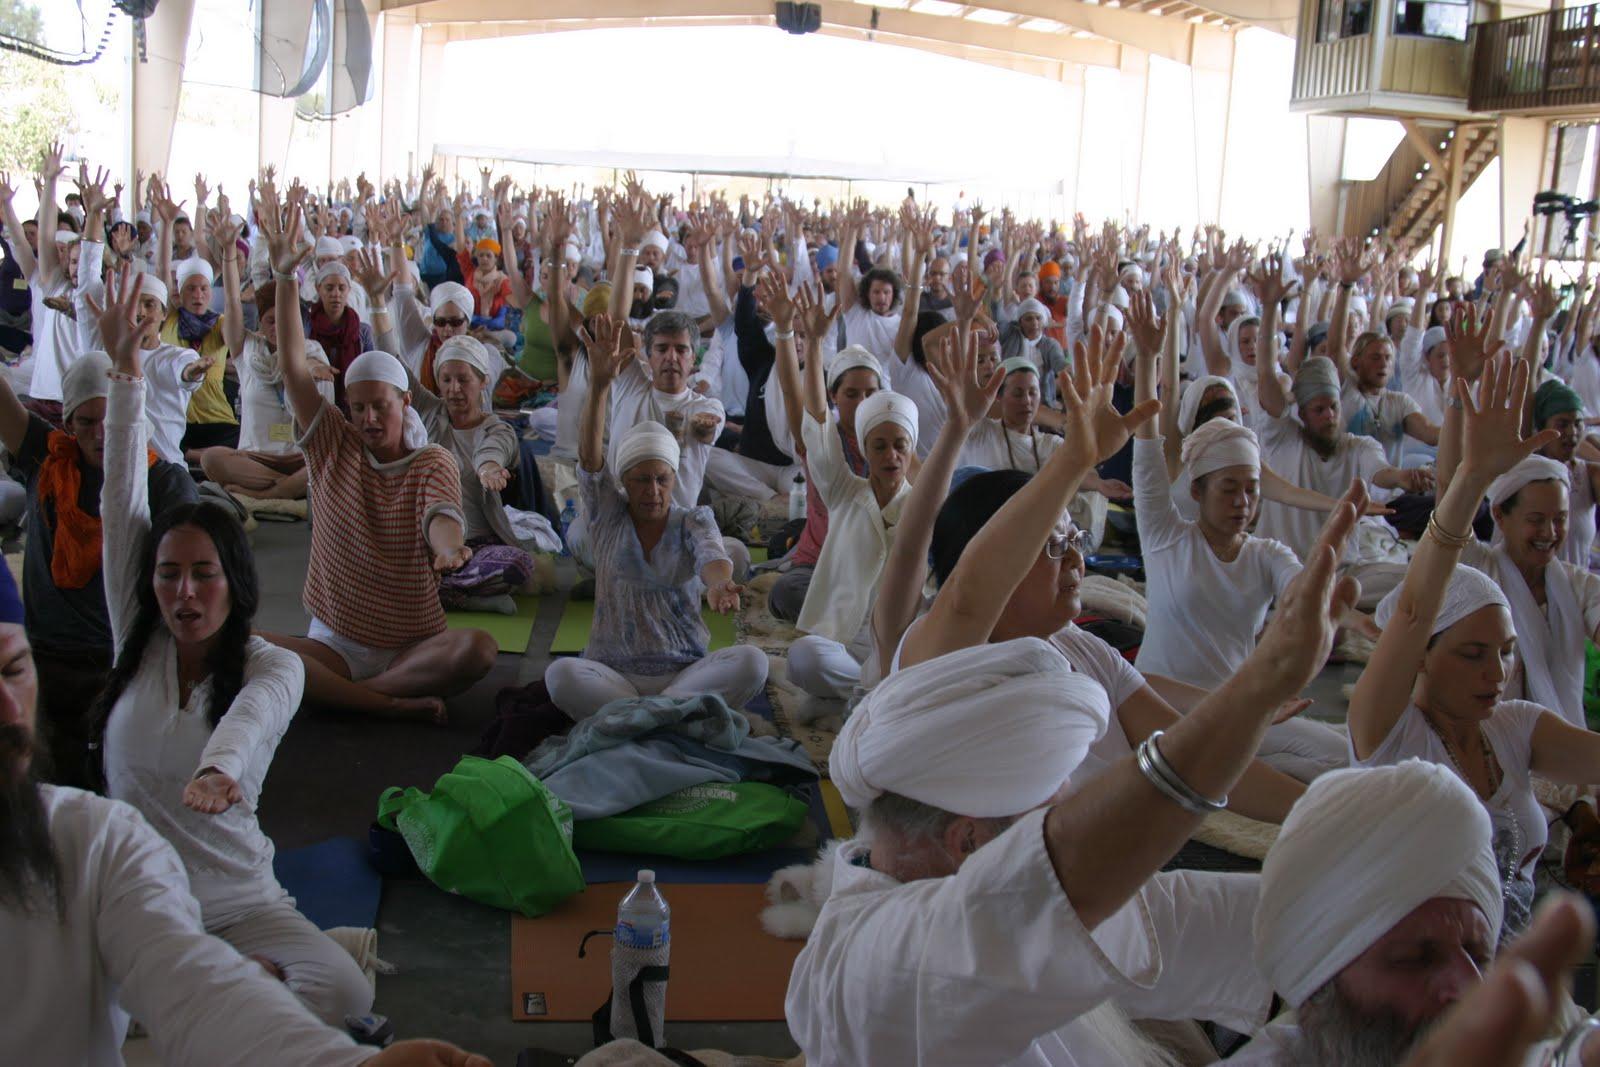 Tantra Yoga Return from white tantric yoga